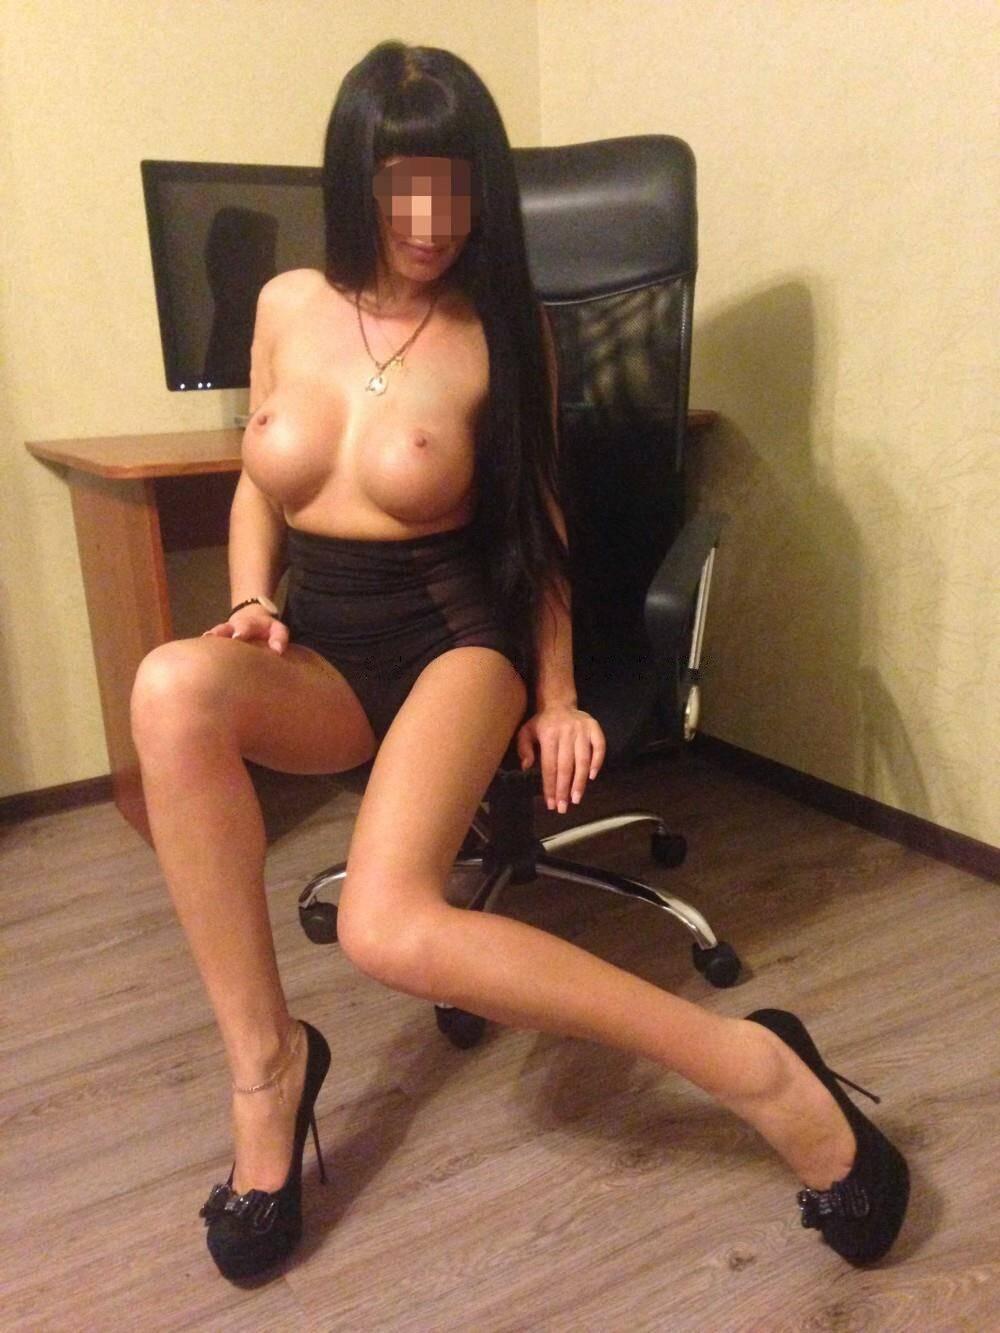 Проститутка Индивидуалка С Благовещенска